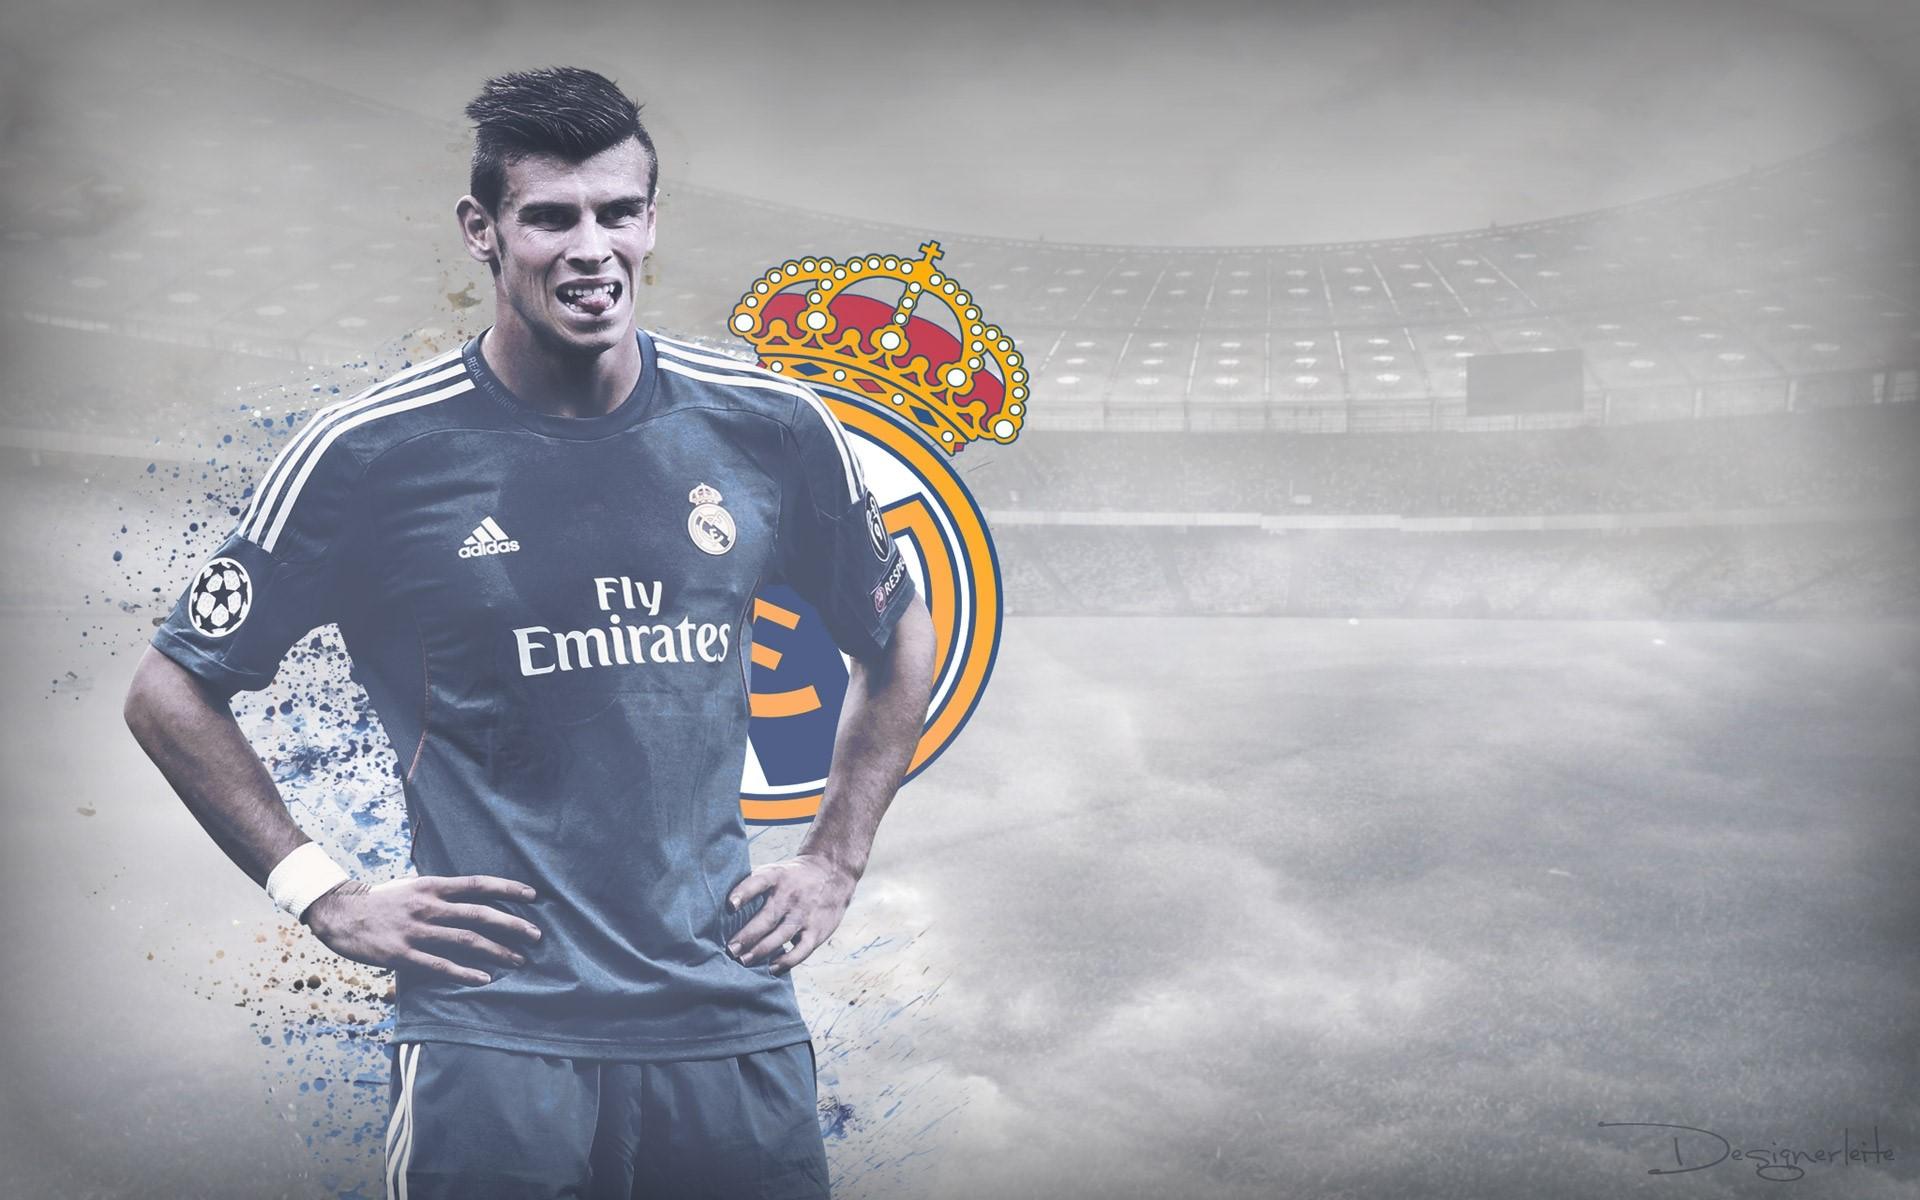 Gareth Bale Wallpapers 2